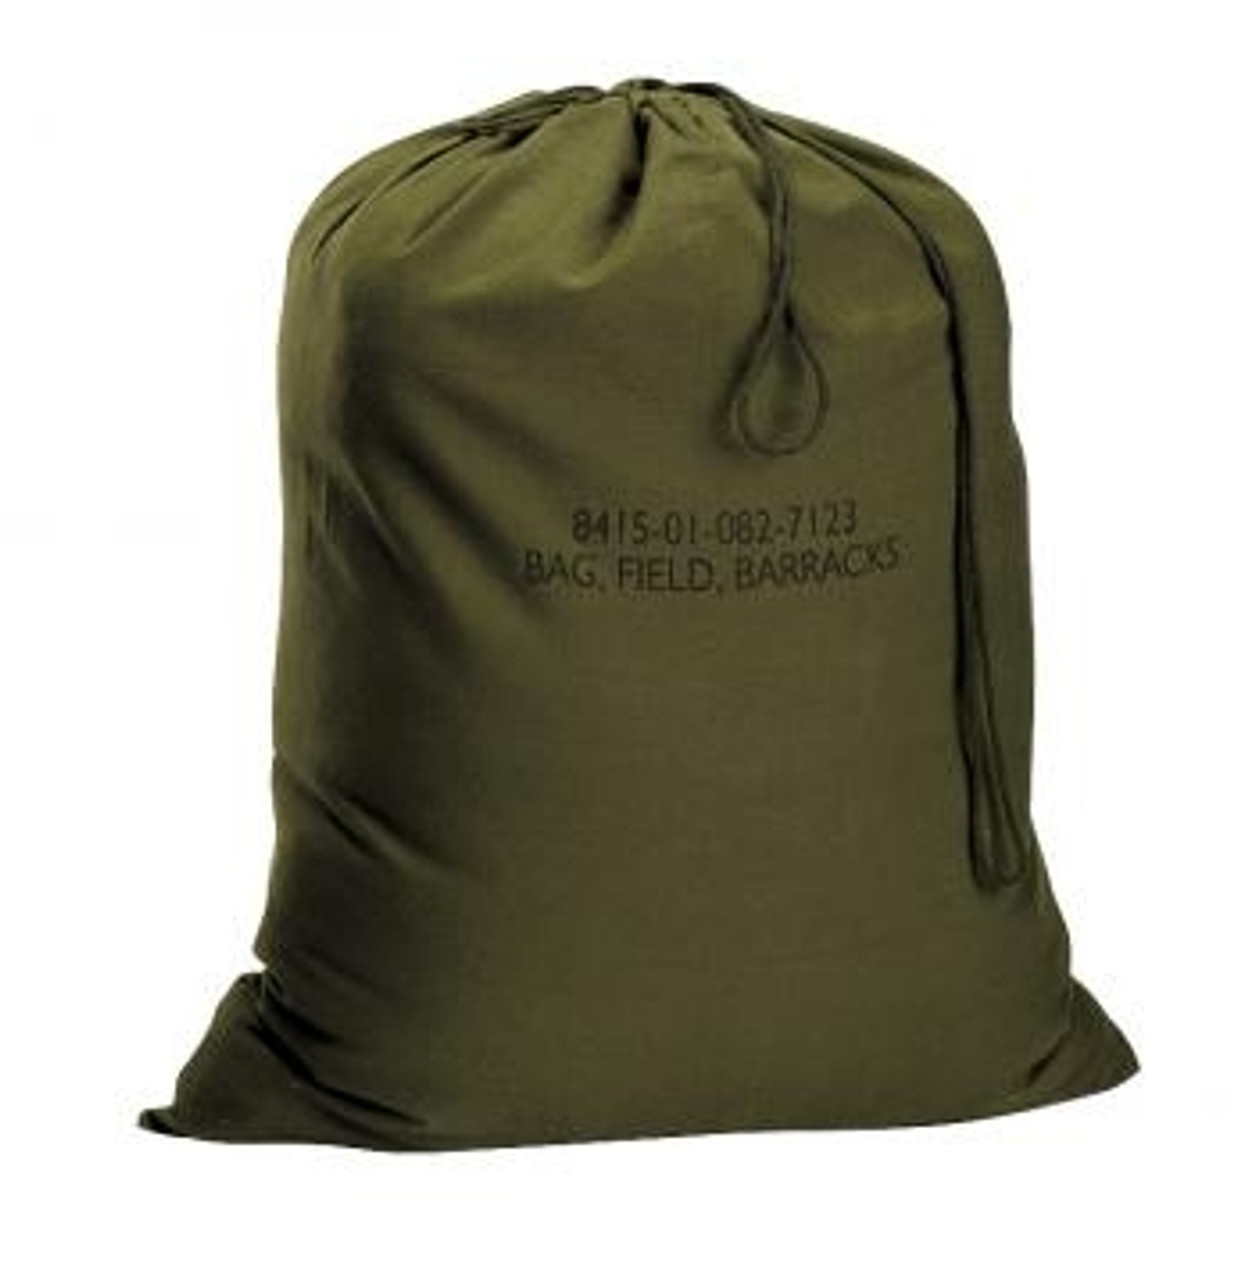 OD Barracks Bag from Hessen Antique